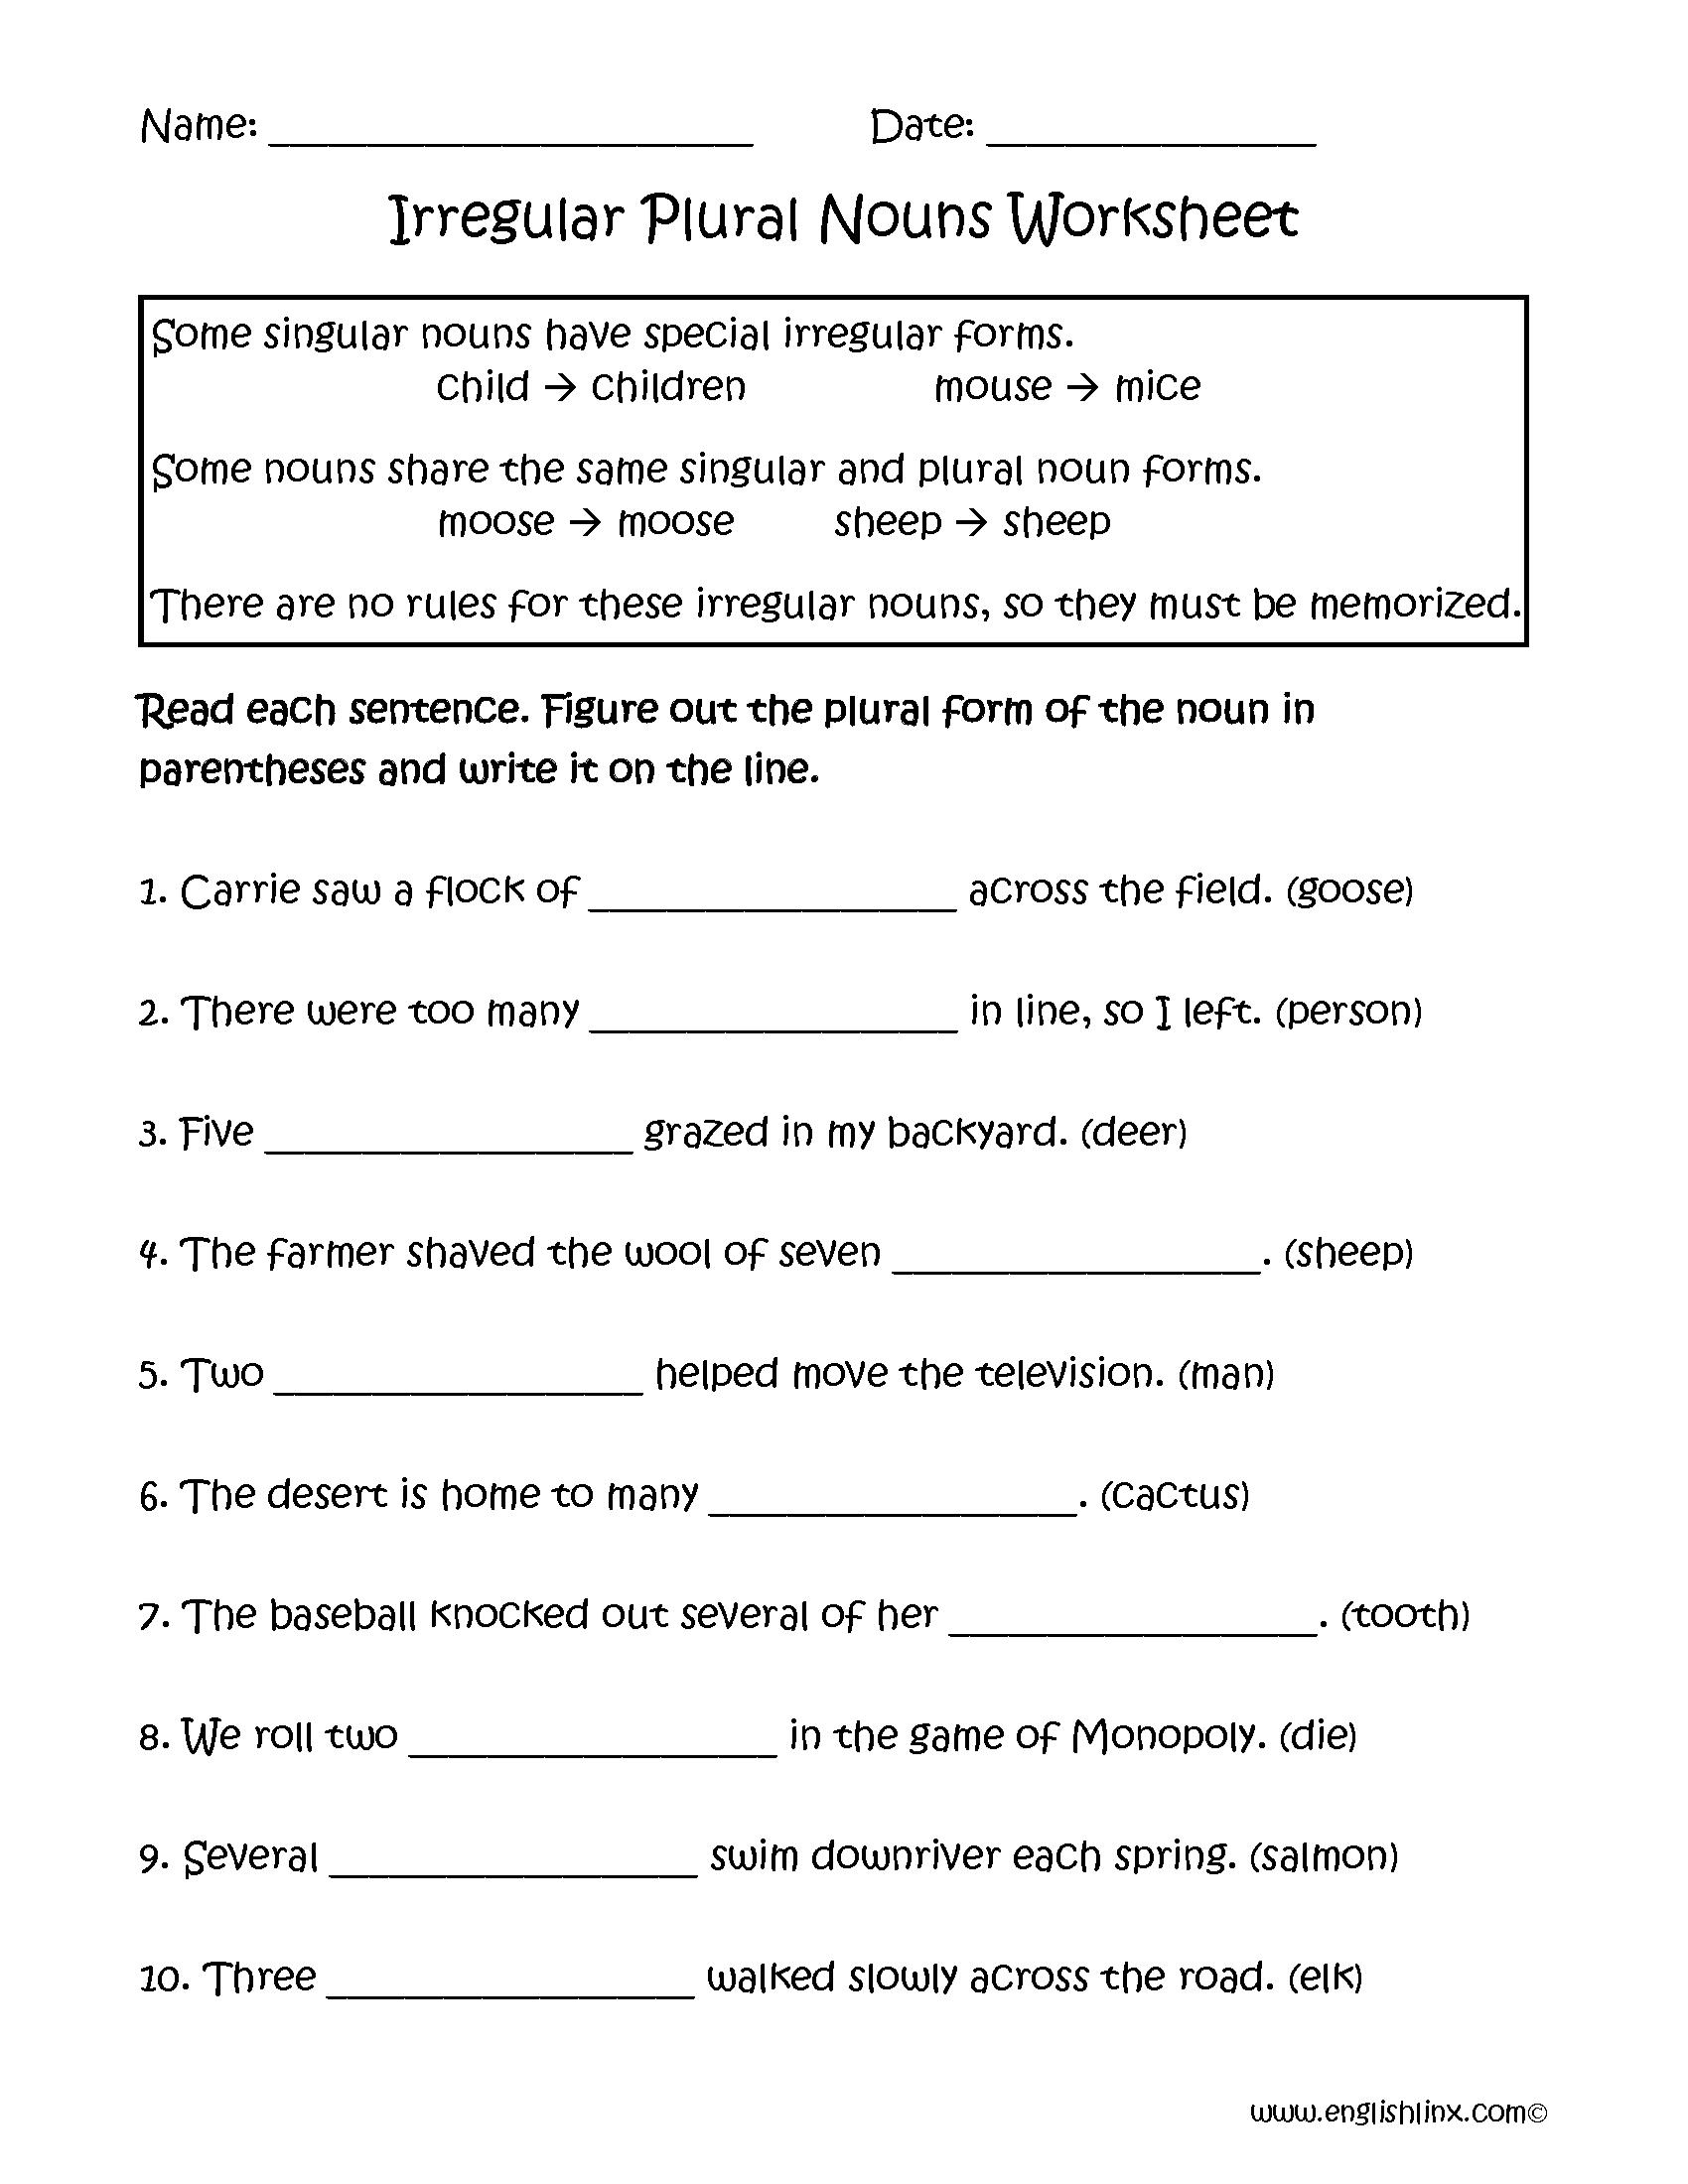 hight resolution of Irregular Plural Nouns Worksheet For 3rd Grade - Nidecmege